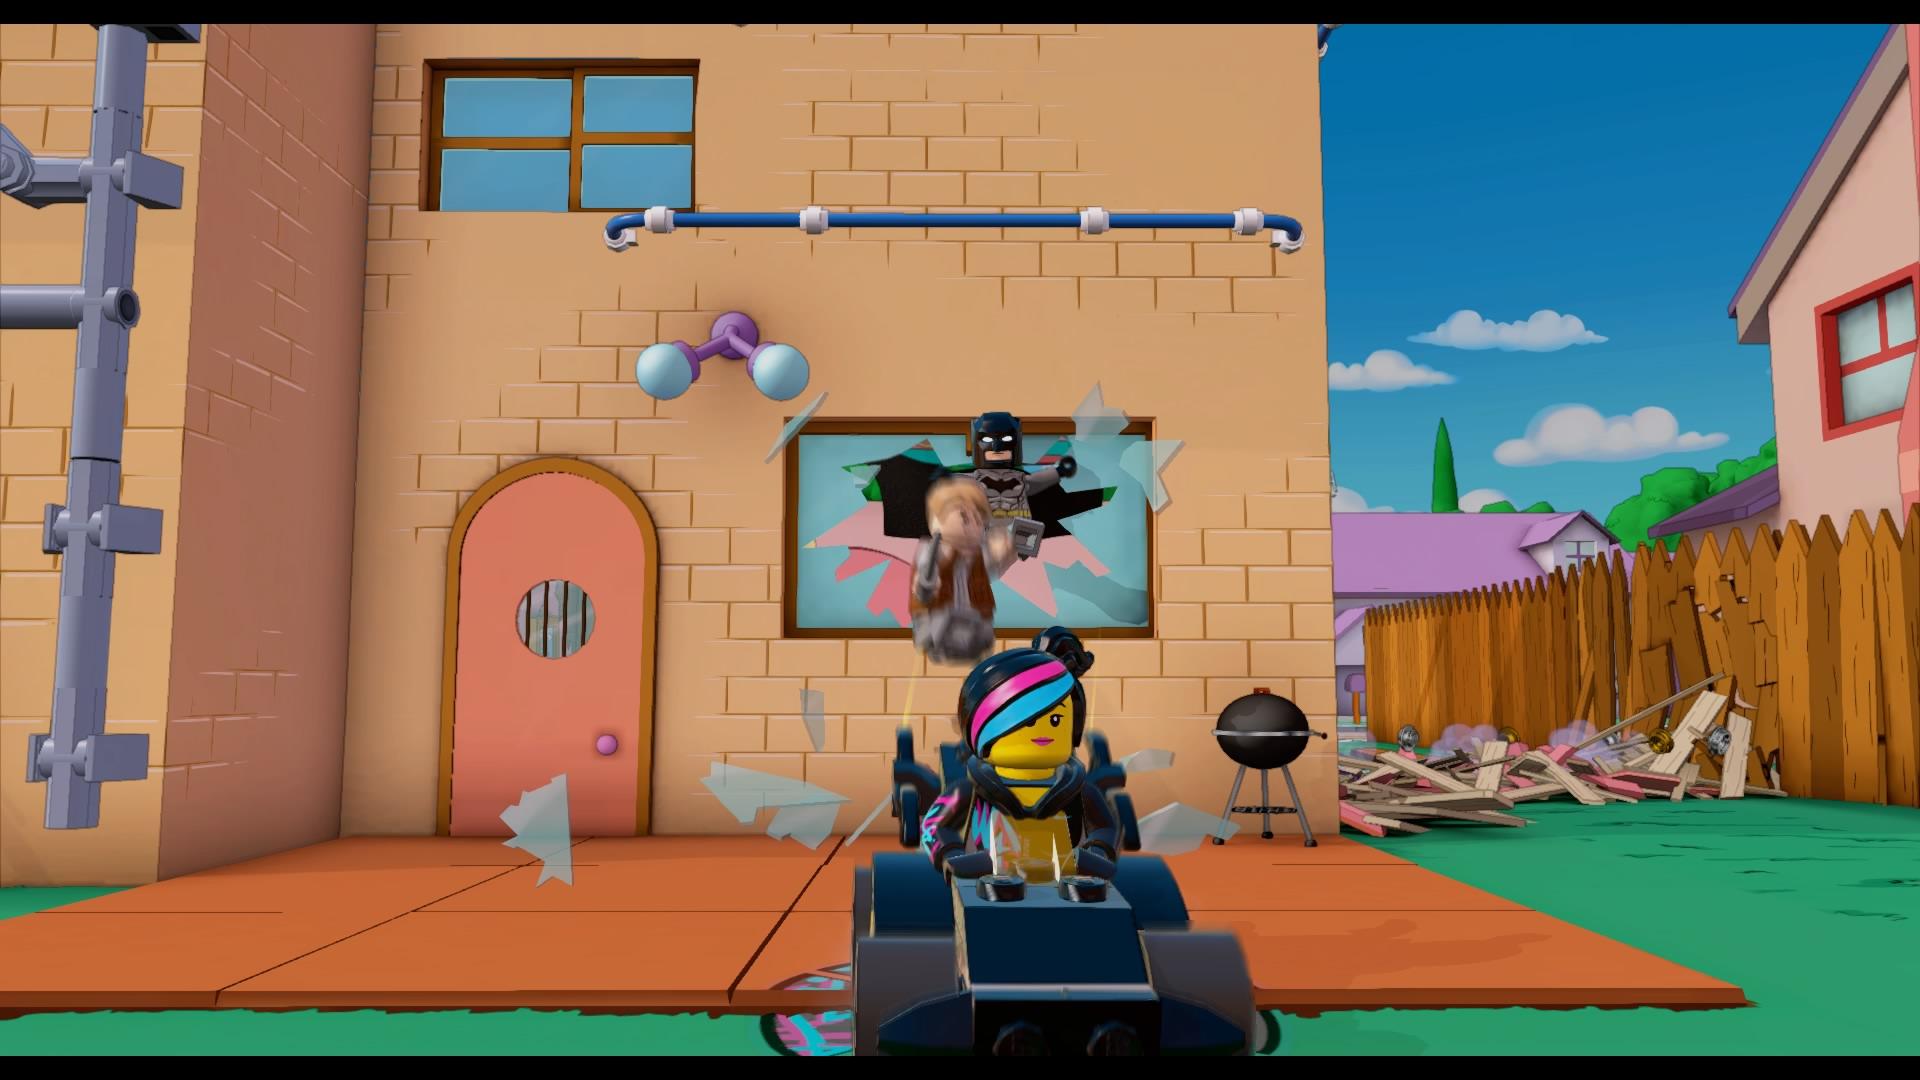 Lego_Dimensions_Wildstyle_Batmobile_Simpsons_House.jpg